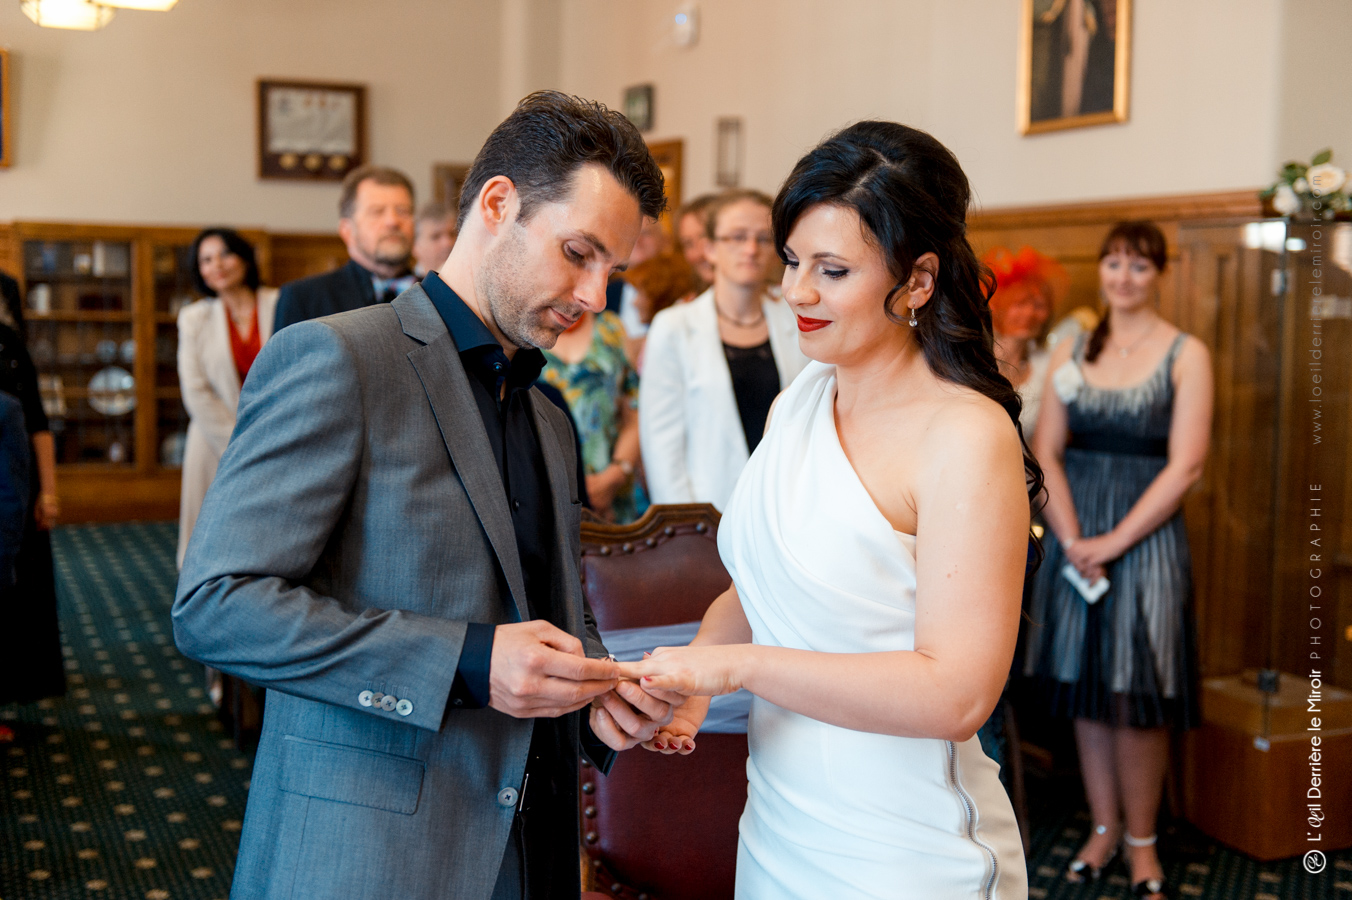 Destination-wedding-photographer-london-AG-016